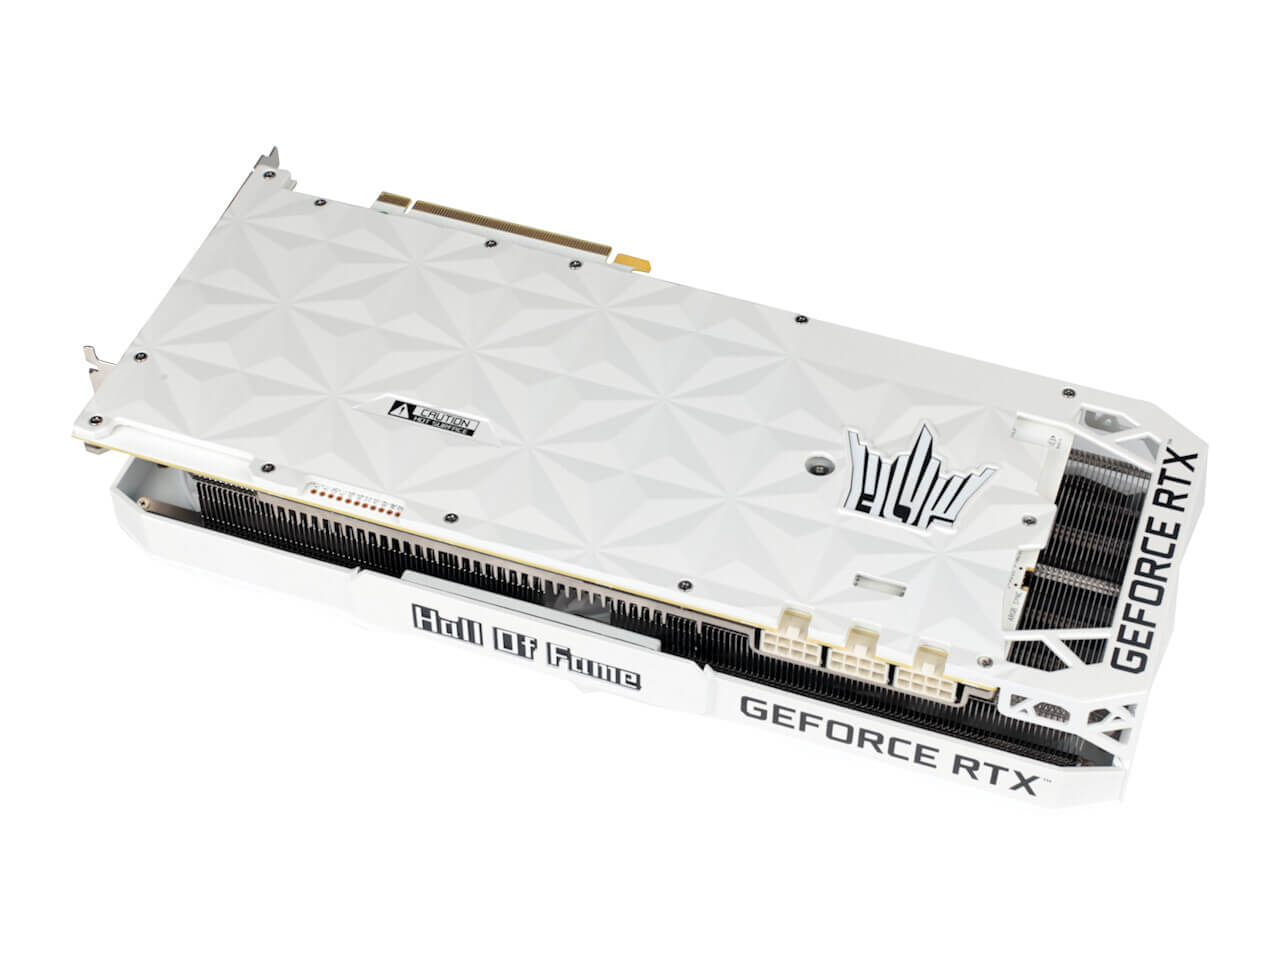 GALAX GeForce RTX 3080 Ti Hall of Fame OC Lab Edition